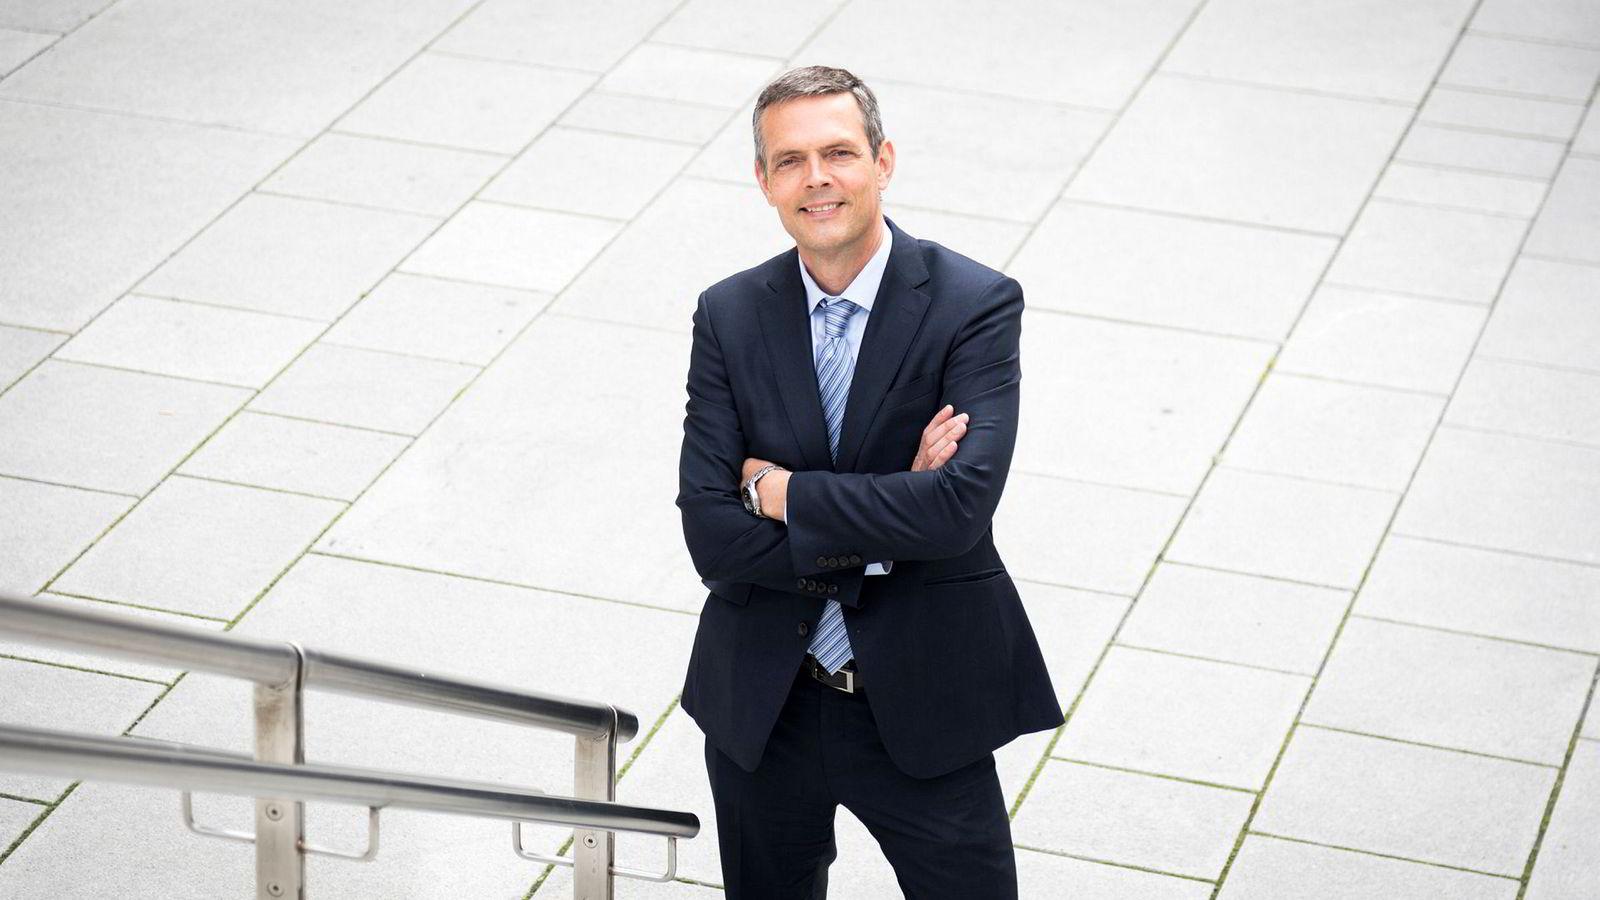 Råvareanalysesjef Bjarne Schieldrop i SEB.